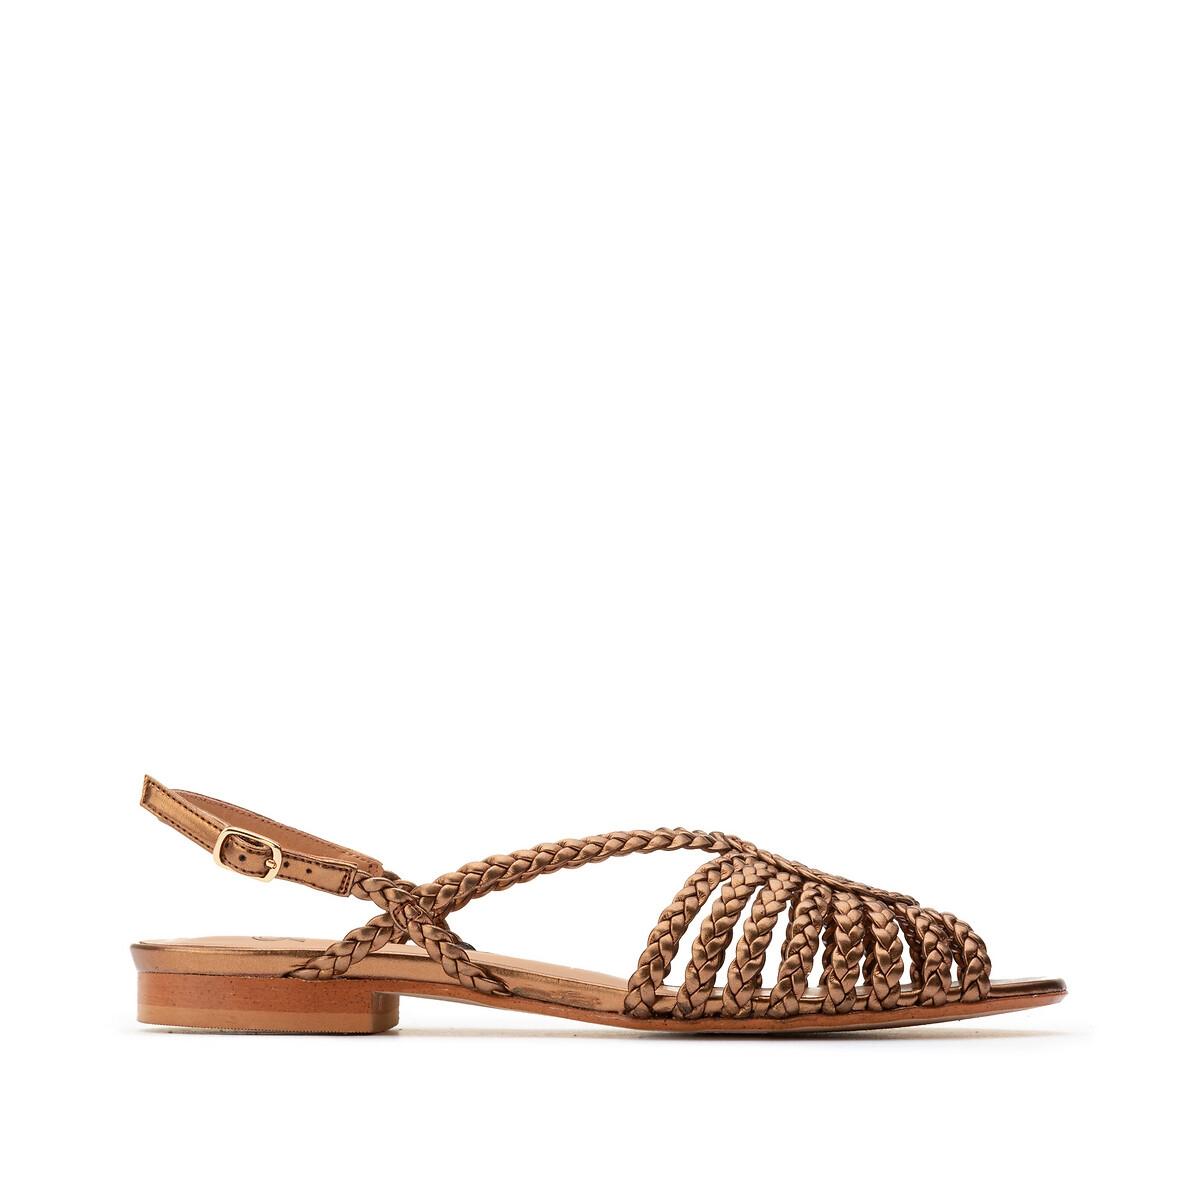 Sandalias trenzadas de piel